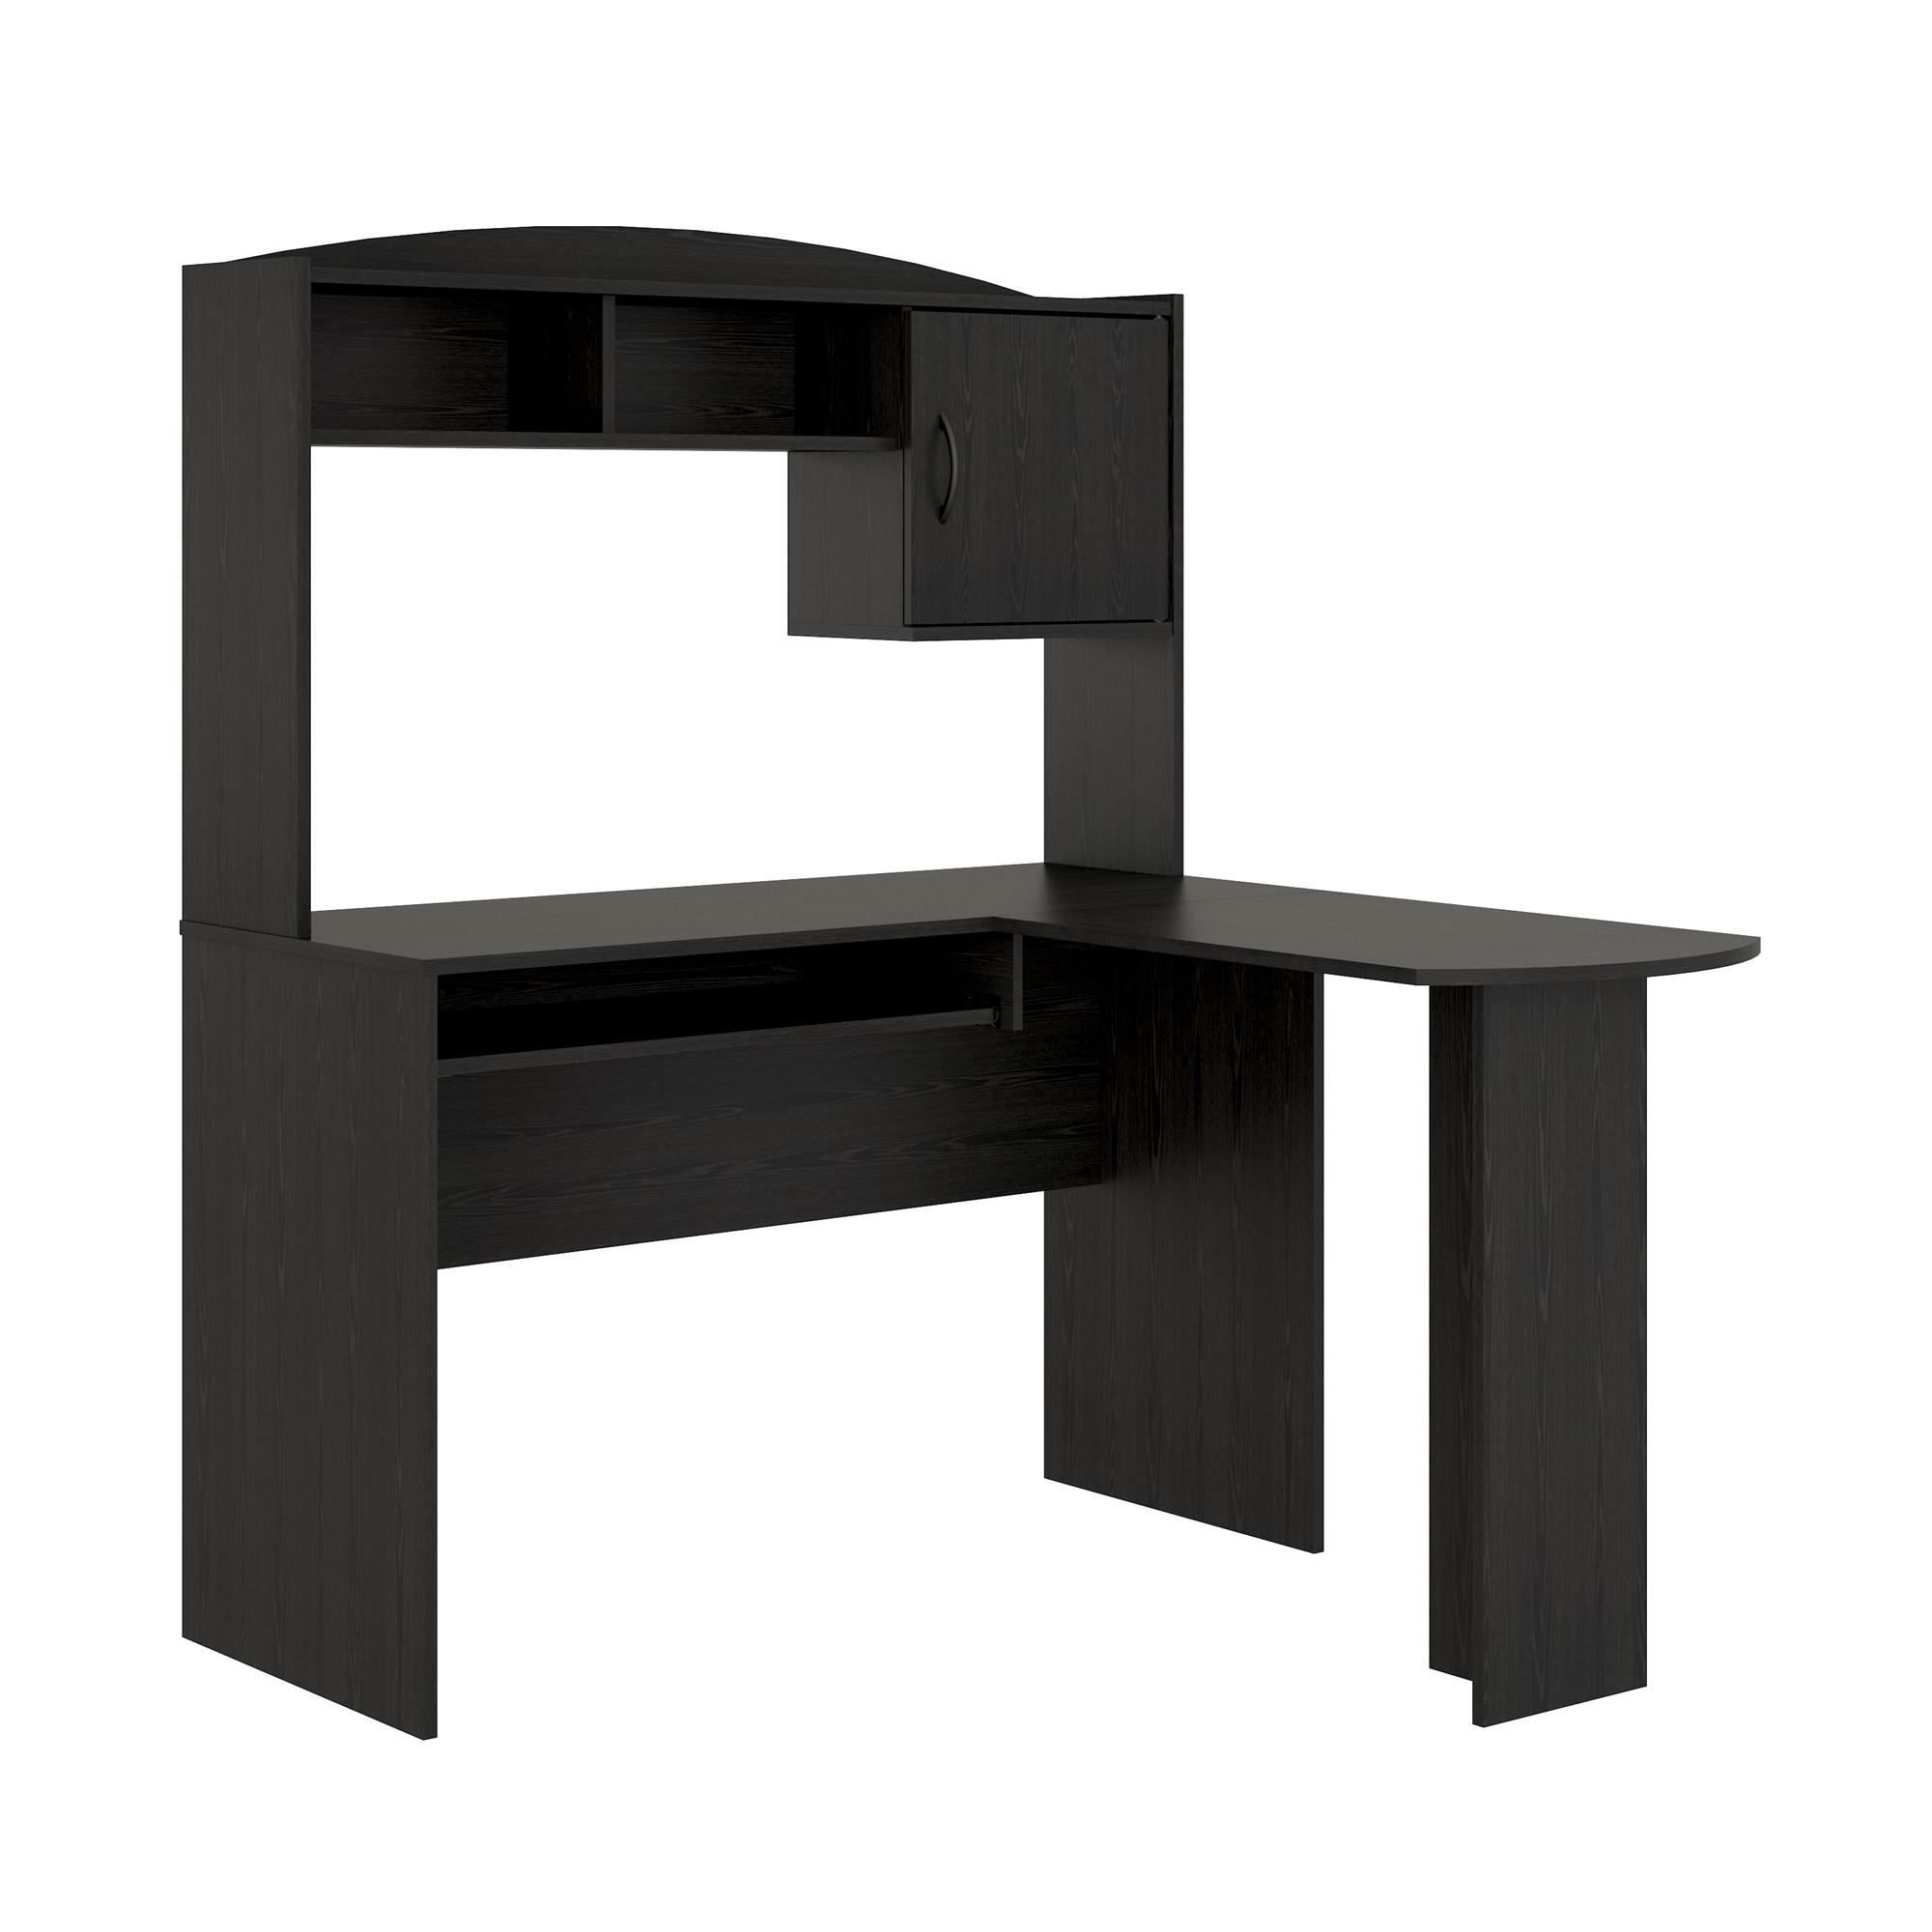 Mainstays L Shaped Desk With Hutch, Multiple Colors   Walmart.com